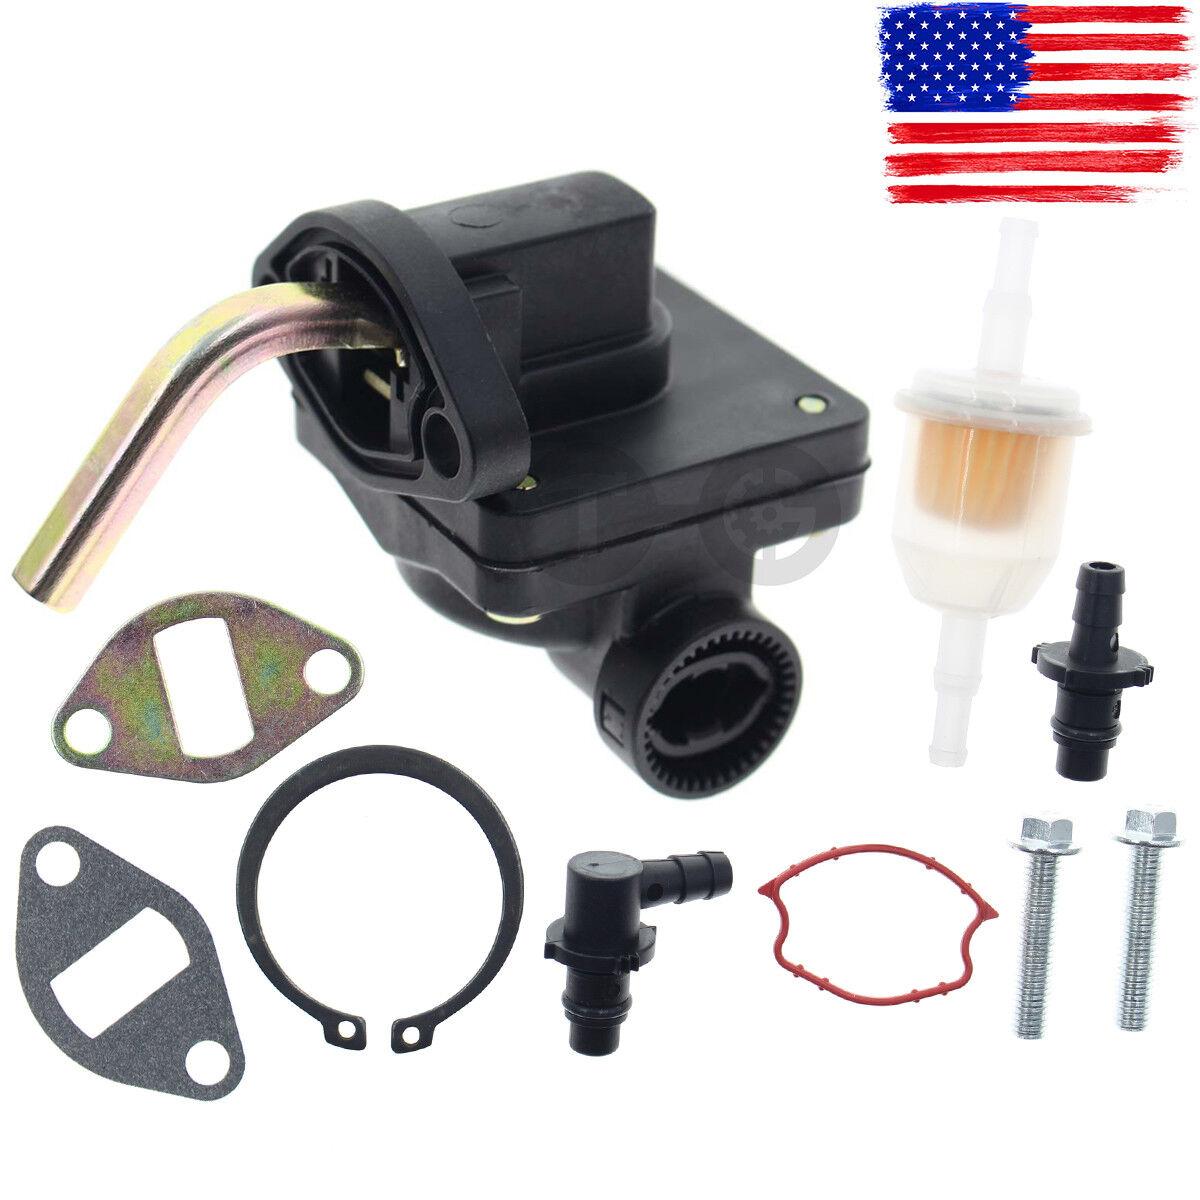 Zreneyfex Fuel Pump for Kohler CV13S CV14S CV15S CV16S CH11S CH12.5S CH13S CH15 CV430 CV460 CV490 CV491 CV491 CV492 CV493 Engine 11 12.5 13 14 15 HP John Deere L110 LT133 LT155 LX255 GT225